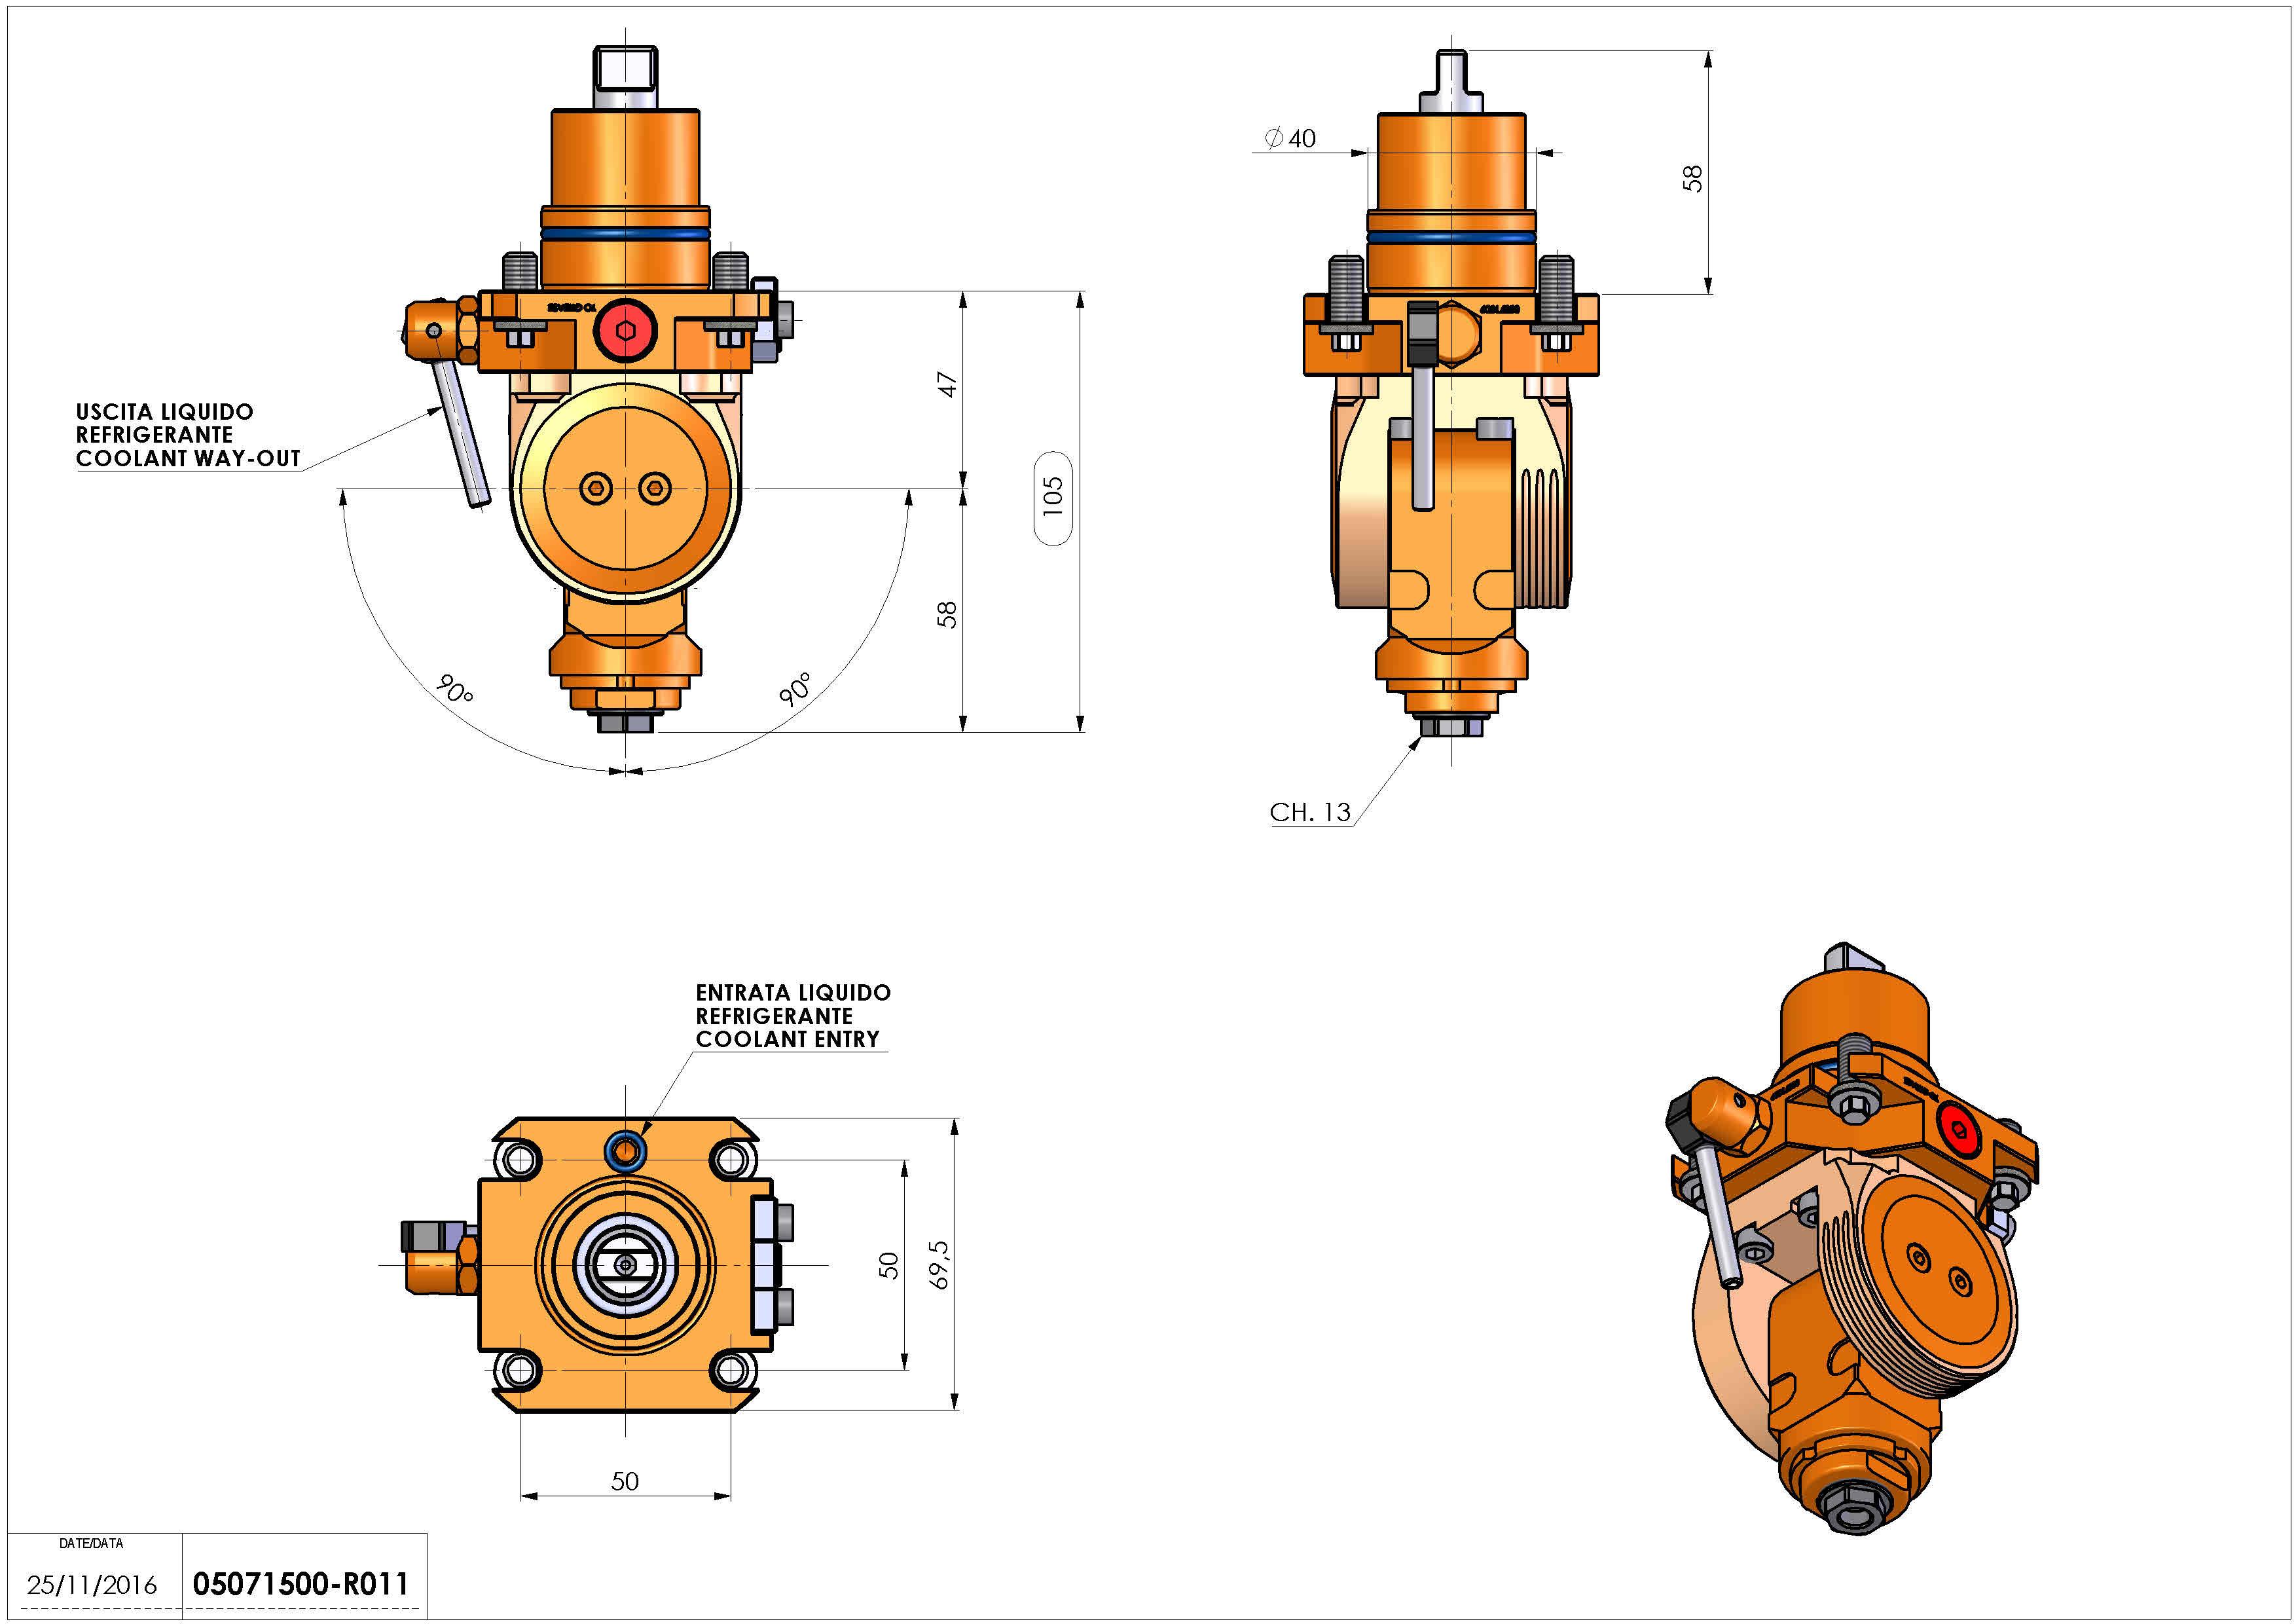 Technical image - LT-T D40 ER11F H47-105 BI.